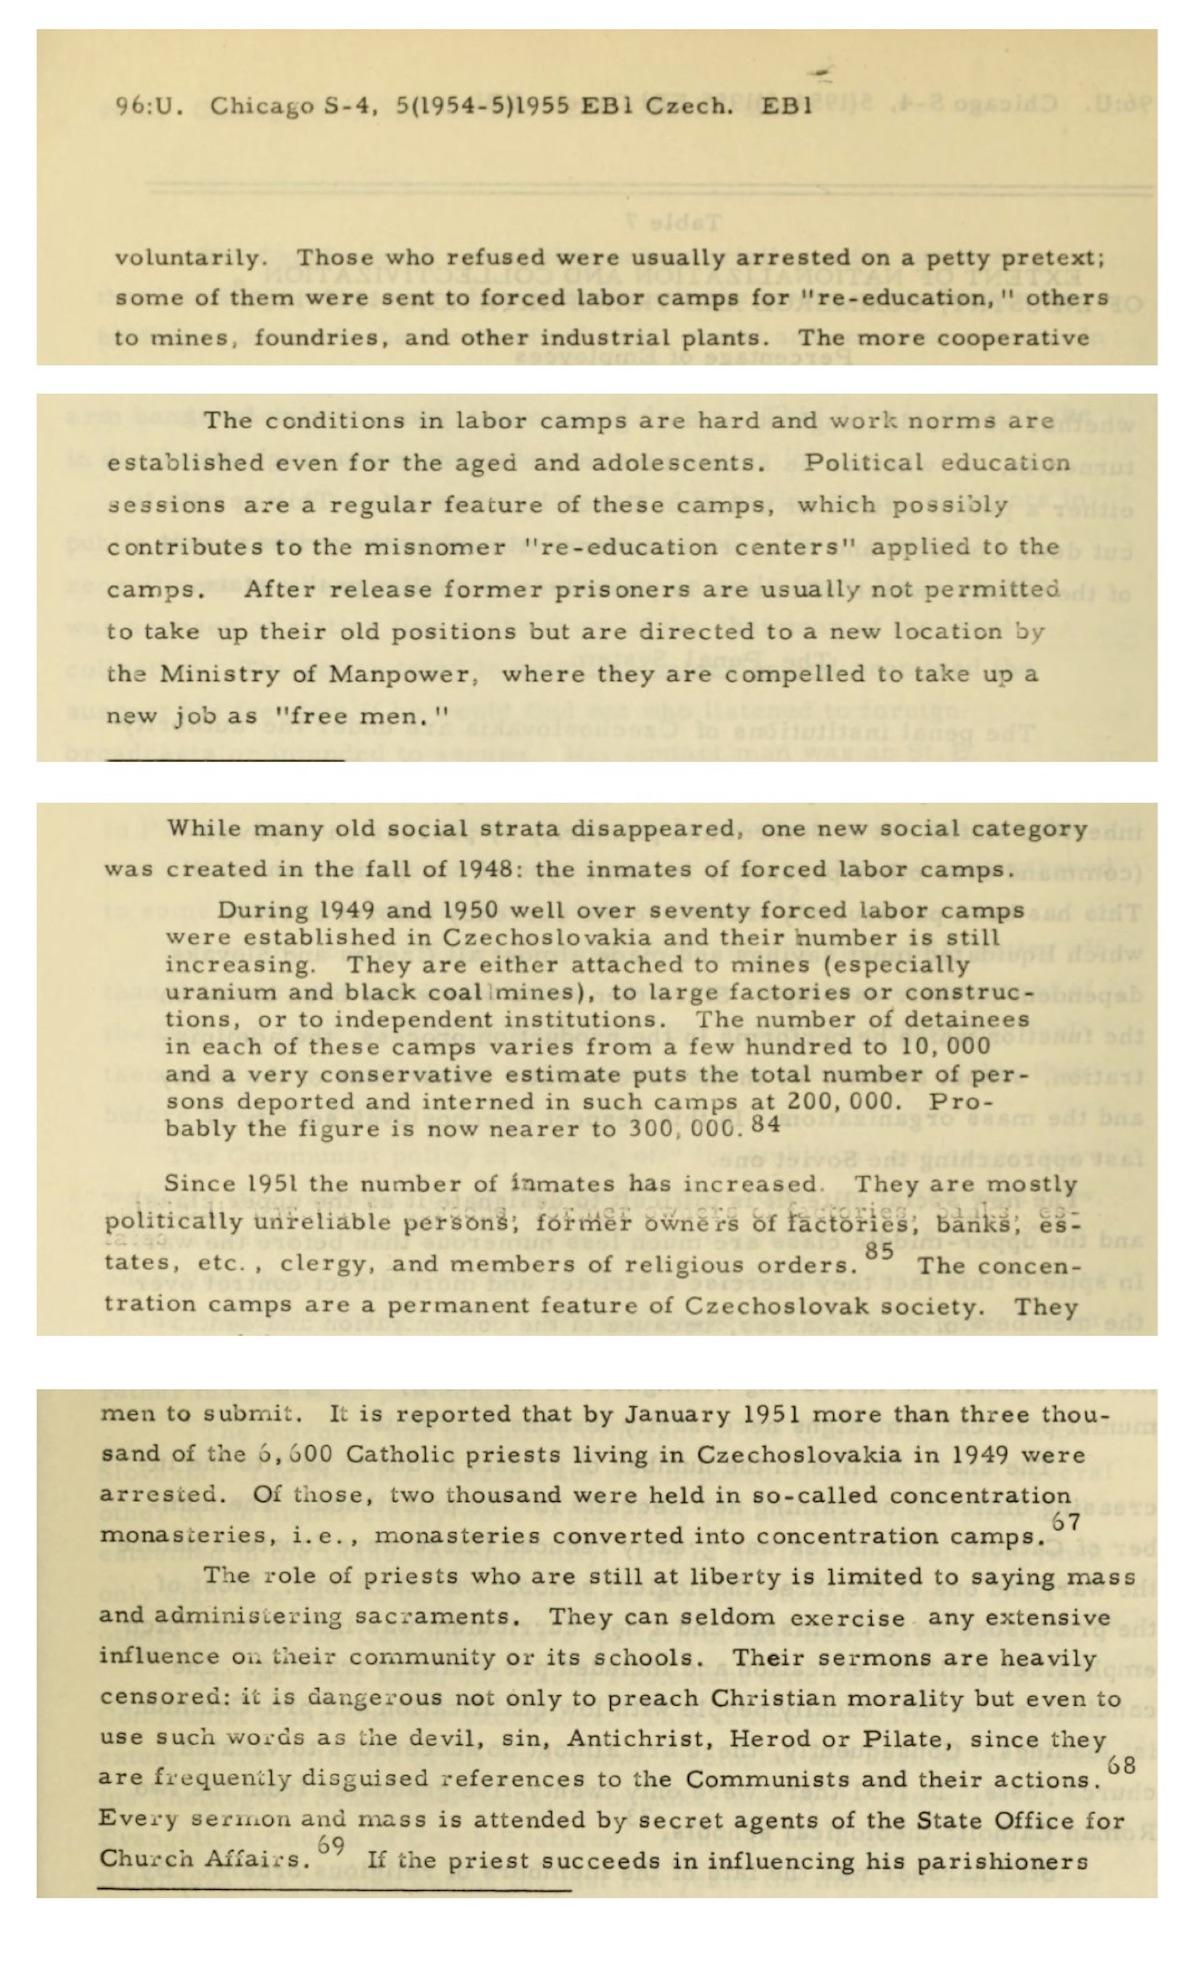 A study of contemporary Czechoslovakia, 1955